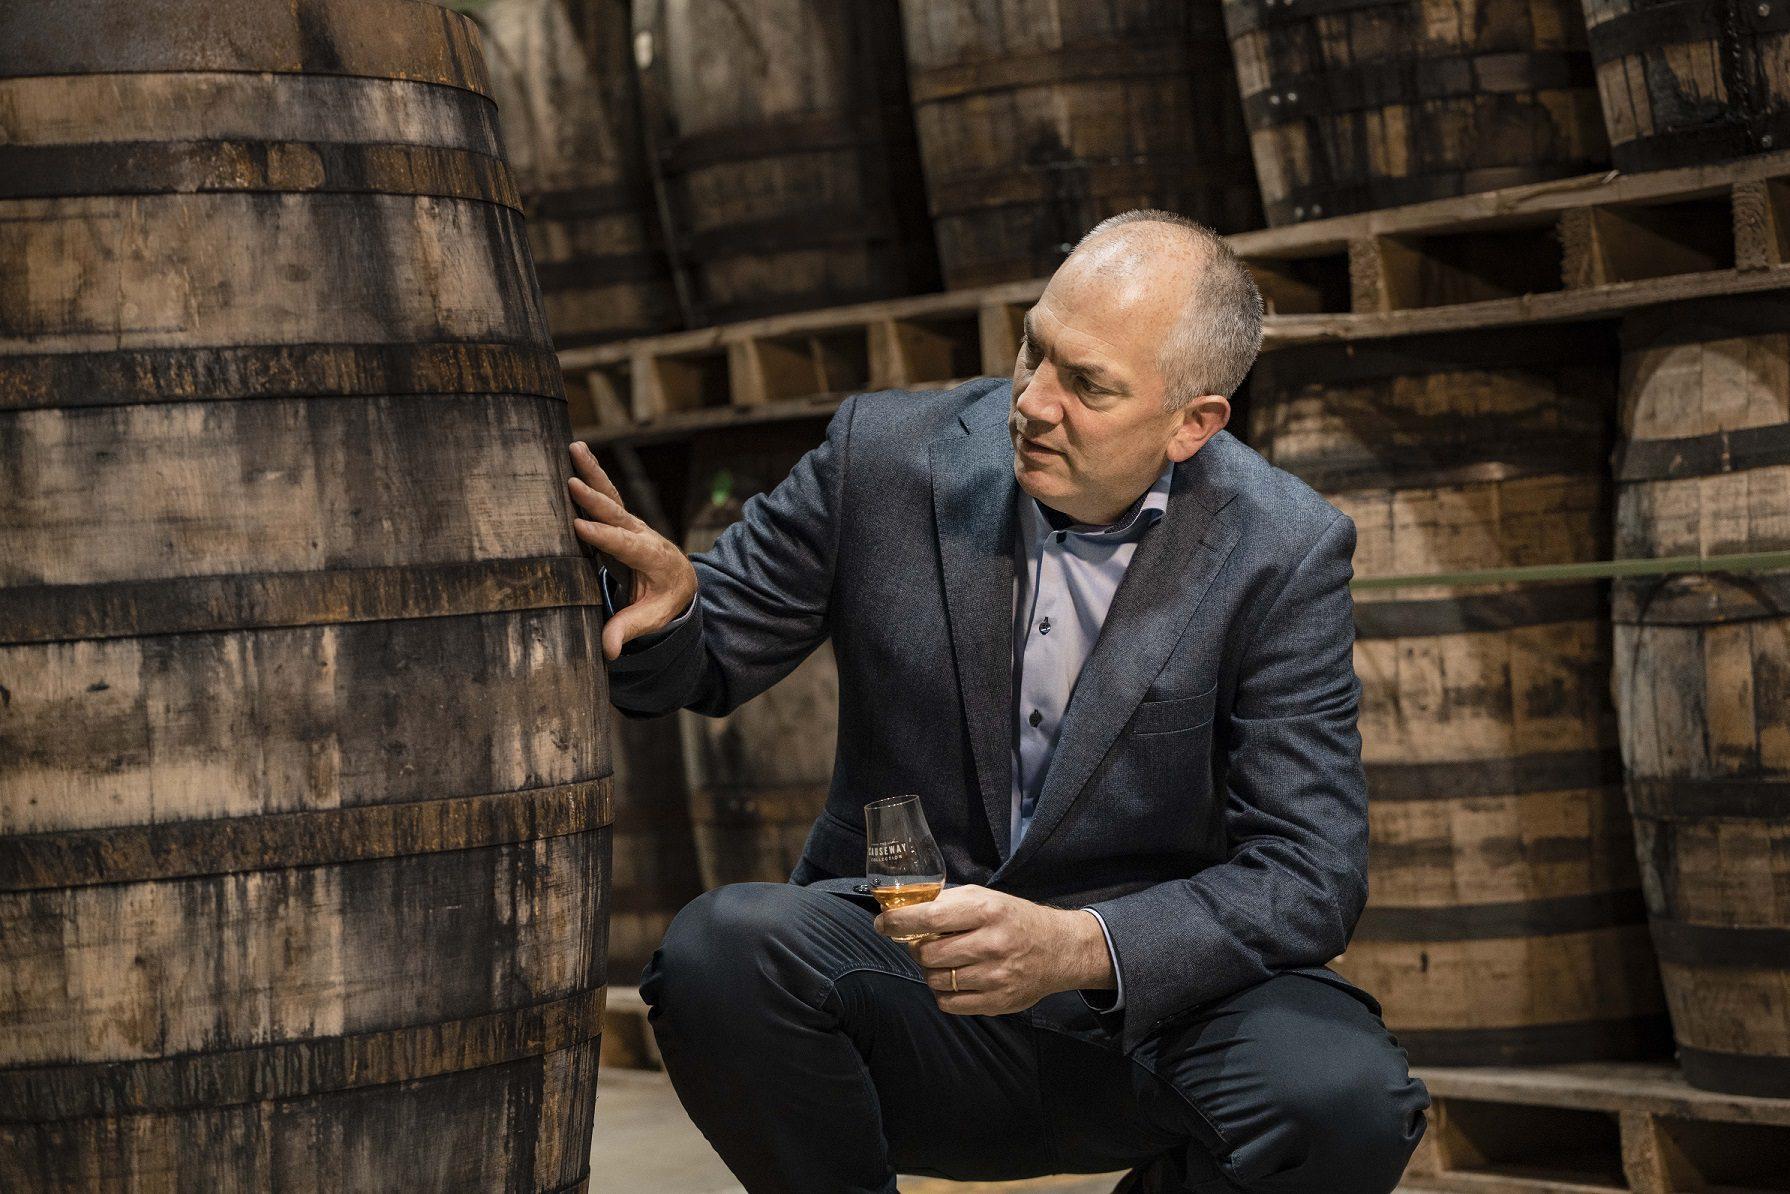 Bushmills Causeway Collection 2021. Irish Whiskey Blogger Stuart Mcnamara. Colum Egan Bushmills Whiskey Master Distiller.